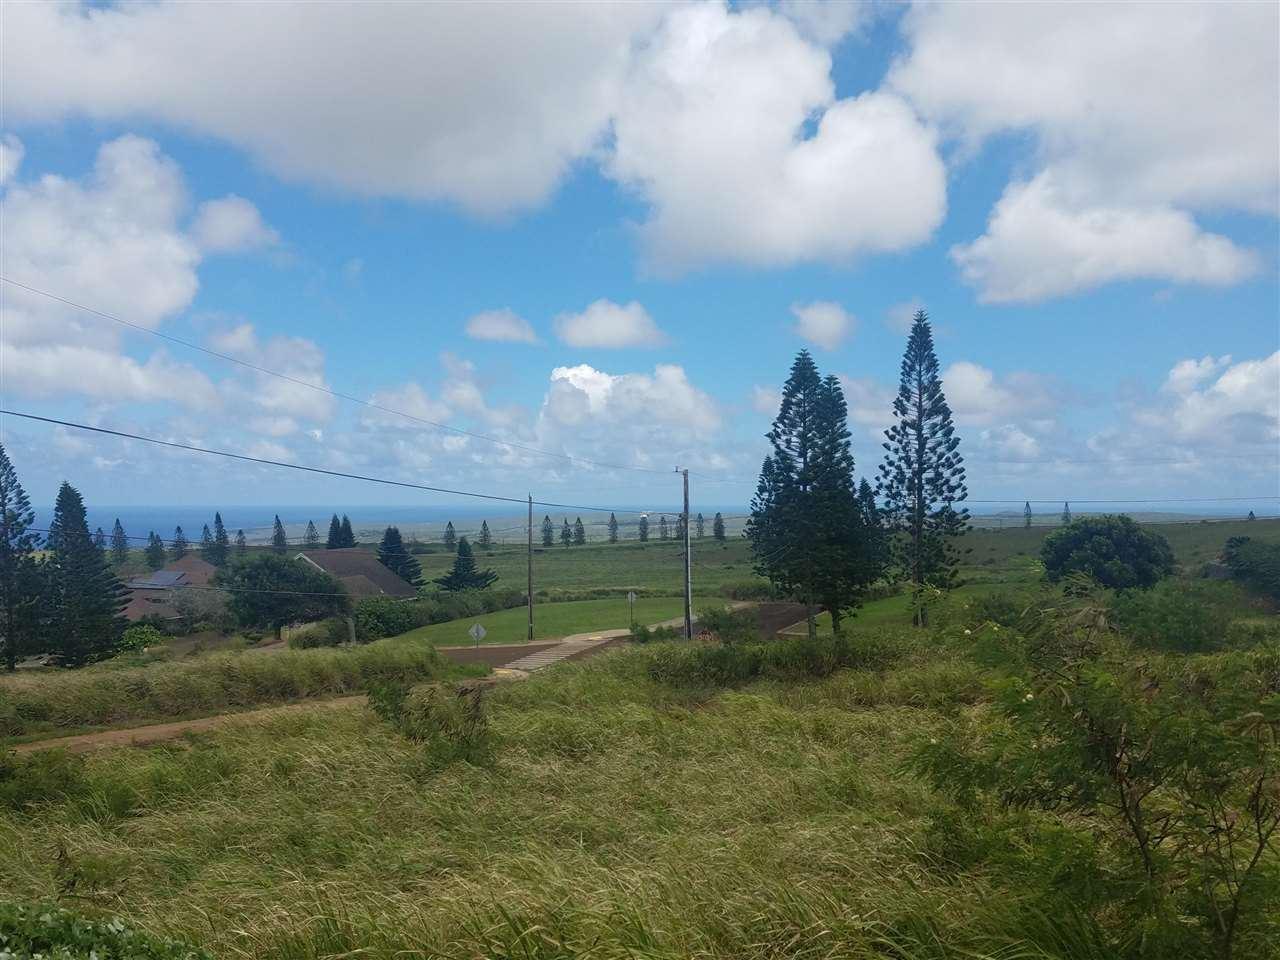 Photo of Halena St #D-54, Maunaloa, HI 96770-0000 (MLS # 391823)